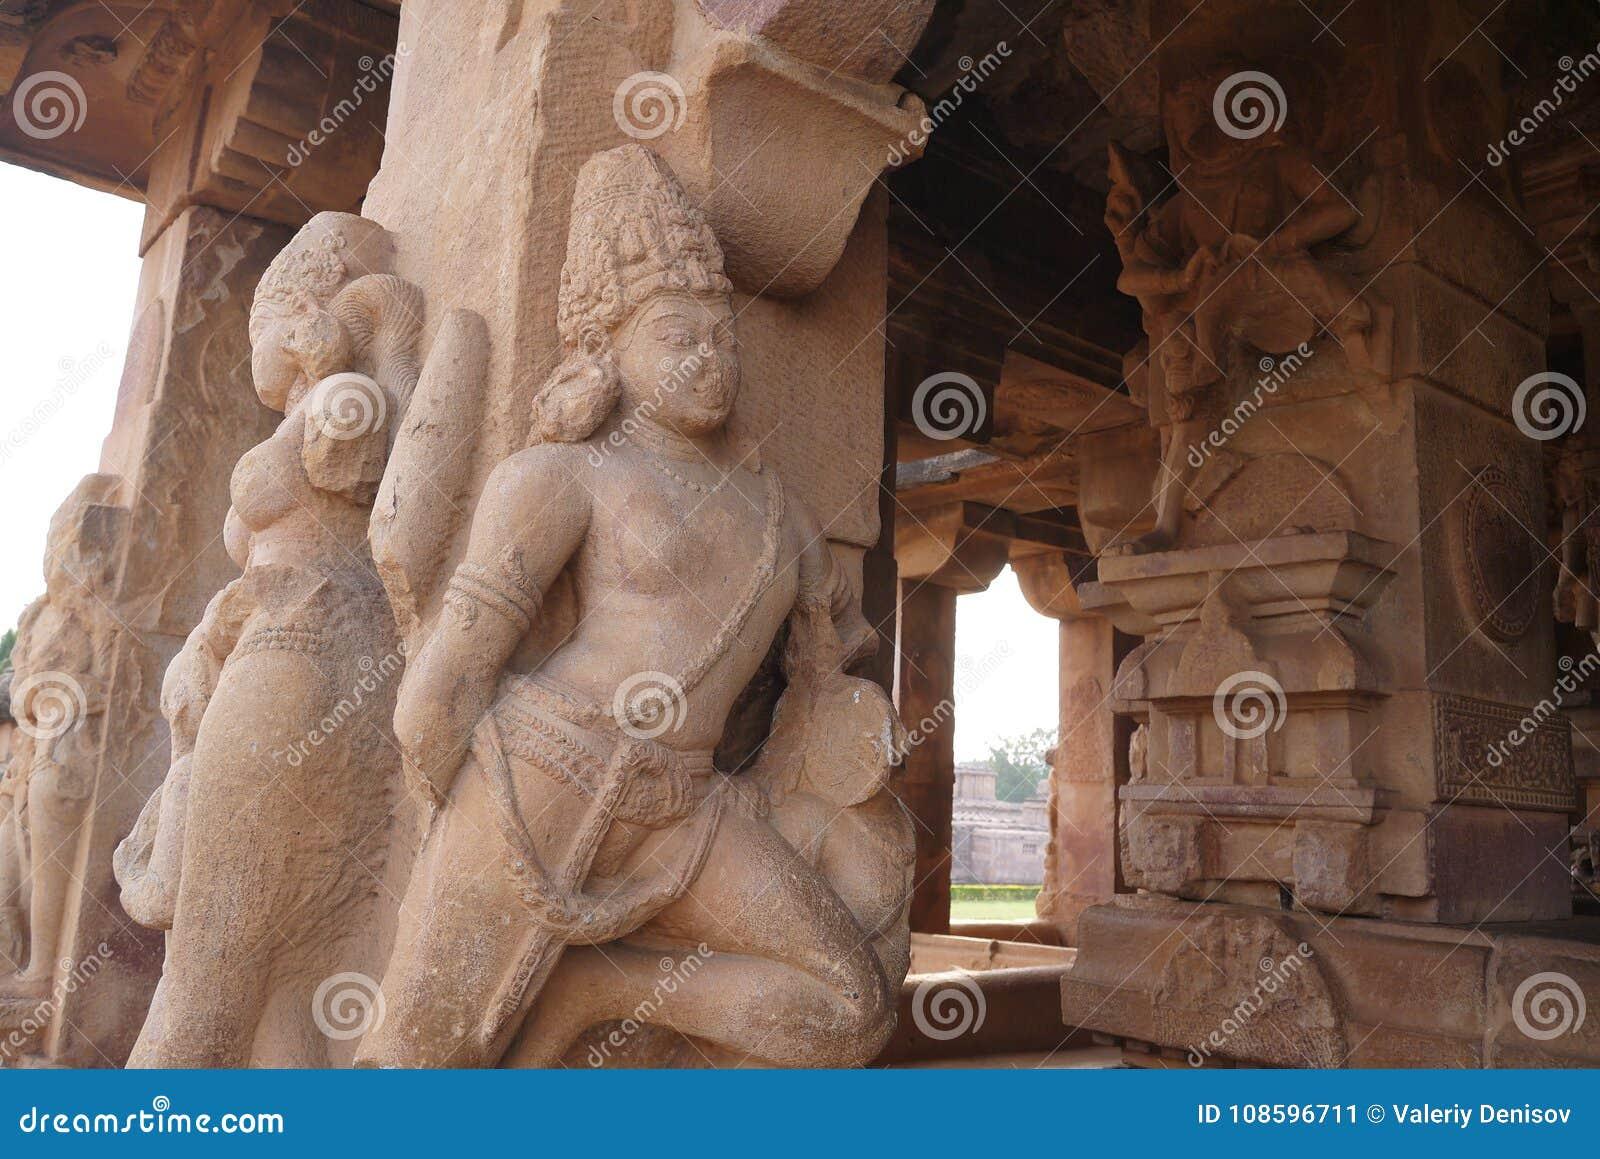 Statues The Decorating Columns Stock Image - Image of travel, vishnu ...